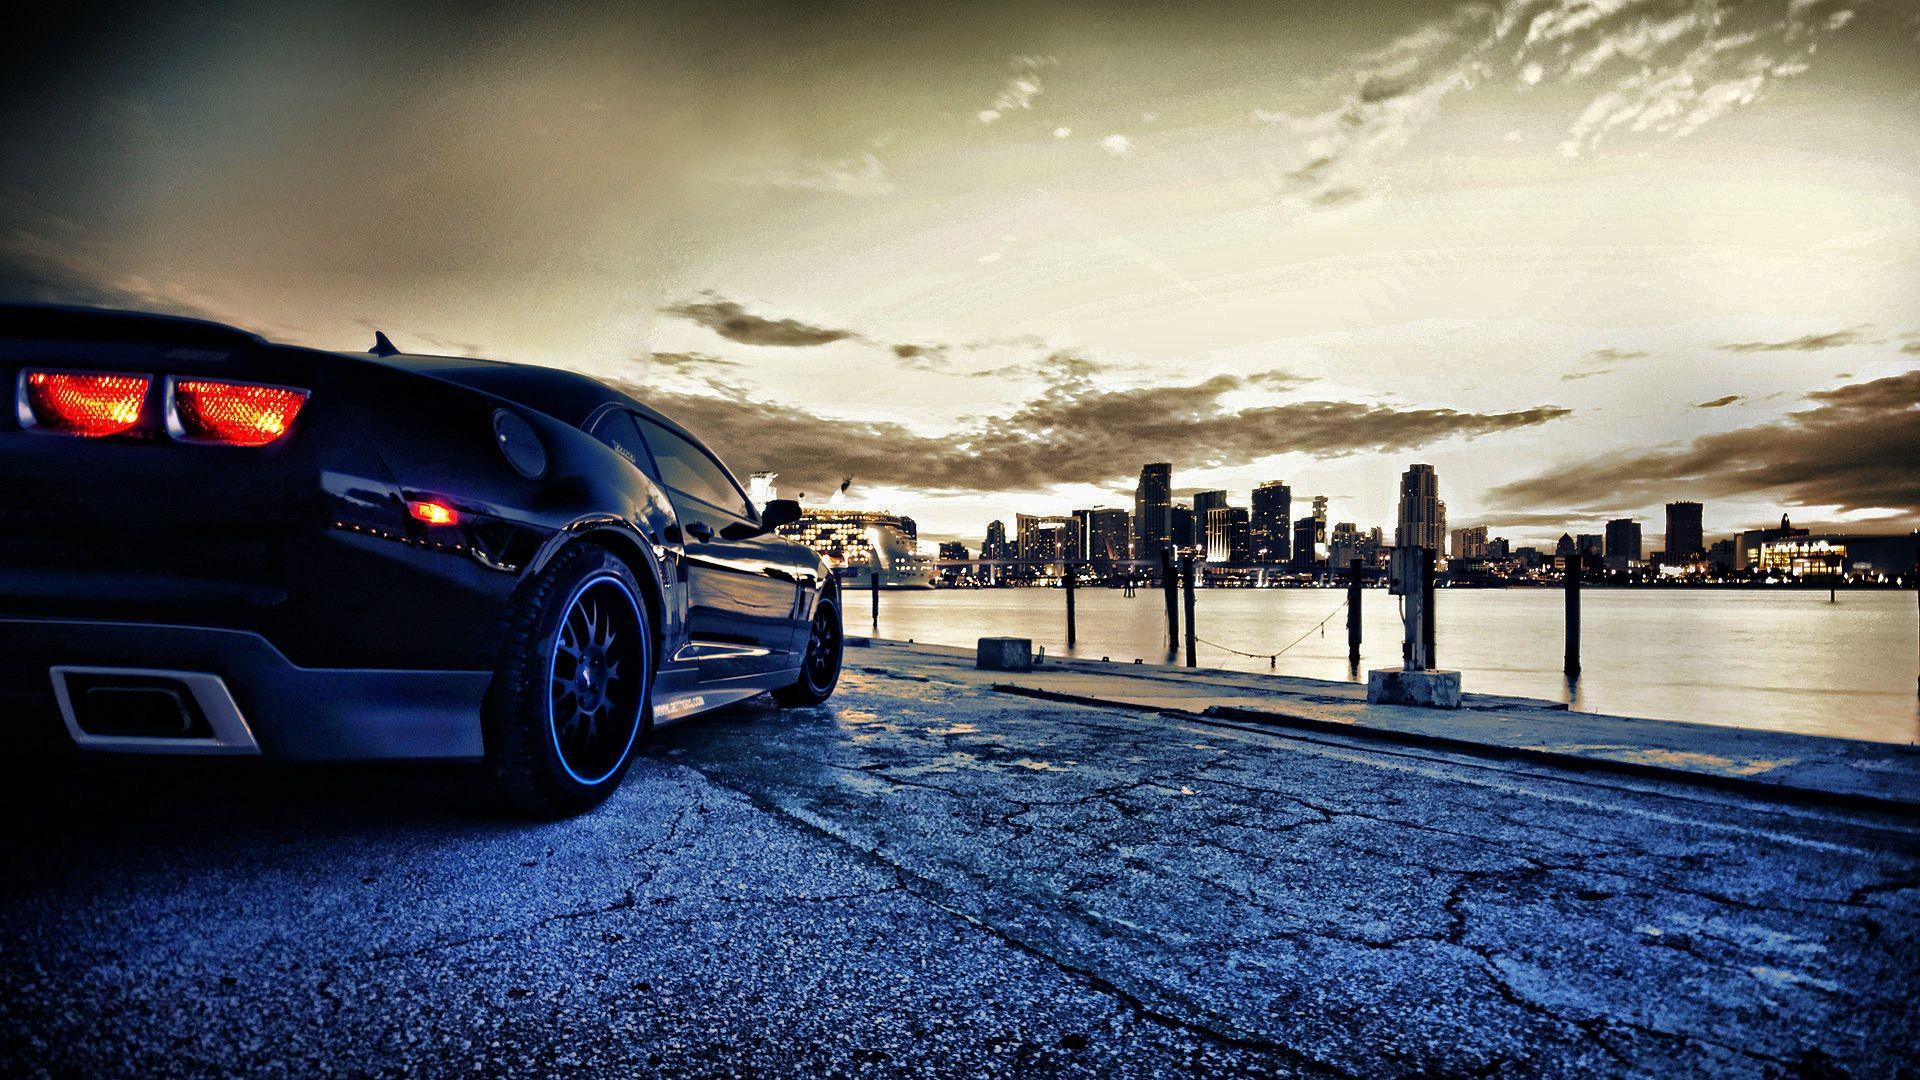 Camaro Wallpaper Hd Widescreen